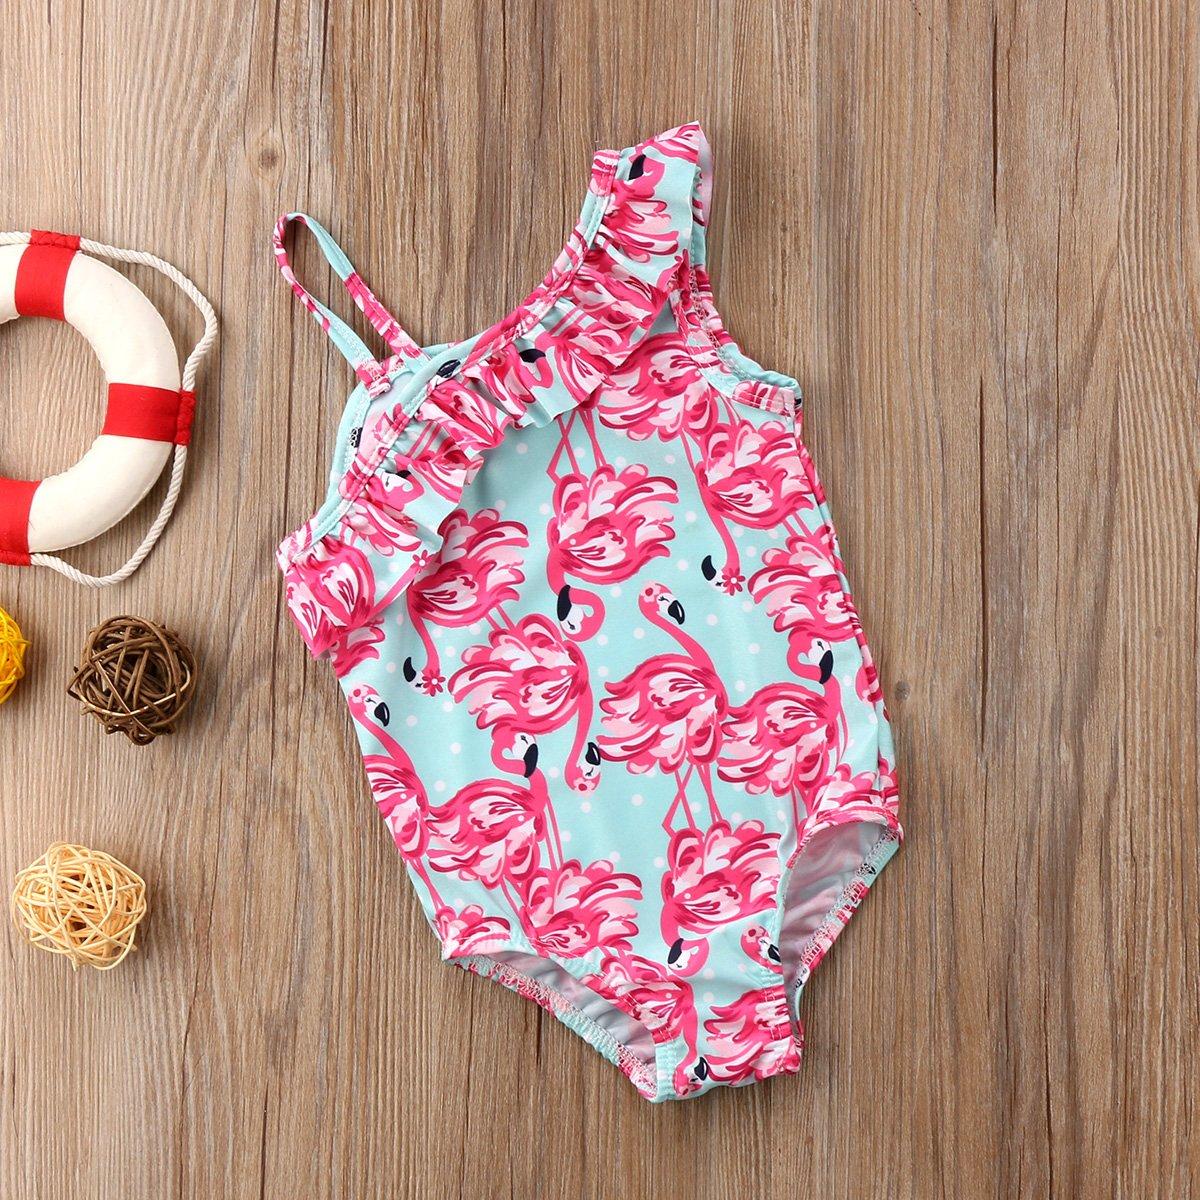 Amazon.com: Niños bebé niñas un hombro Flamingo volantes ...